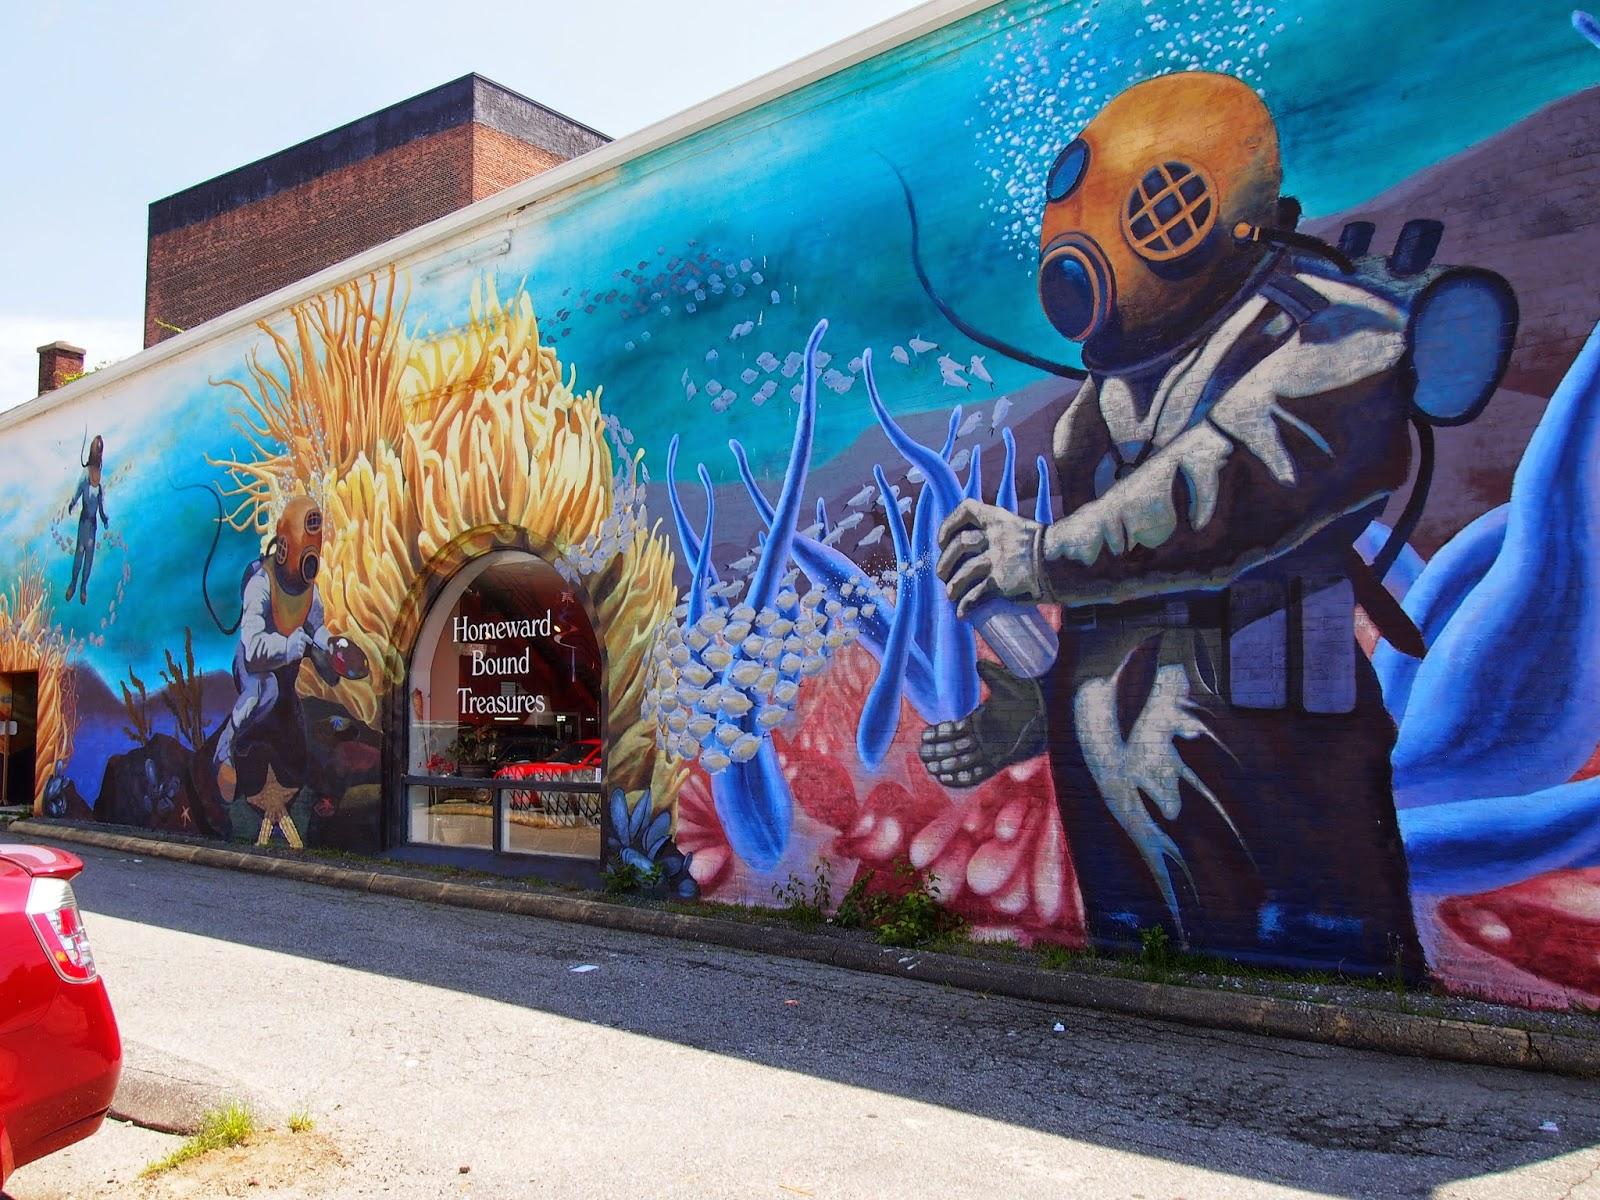 street art in new london, connecticut of scuba divers